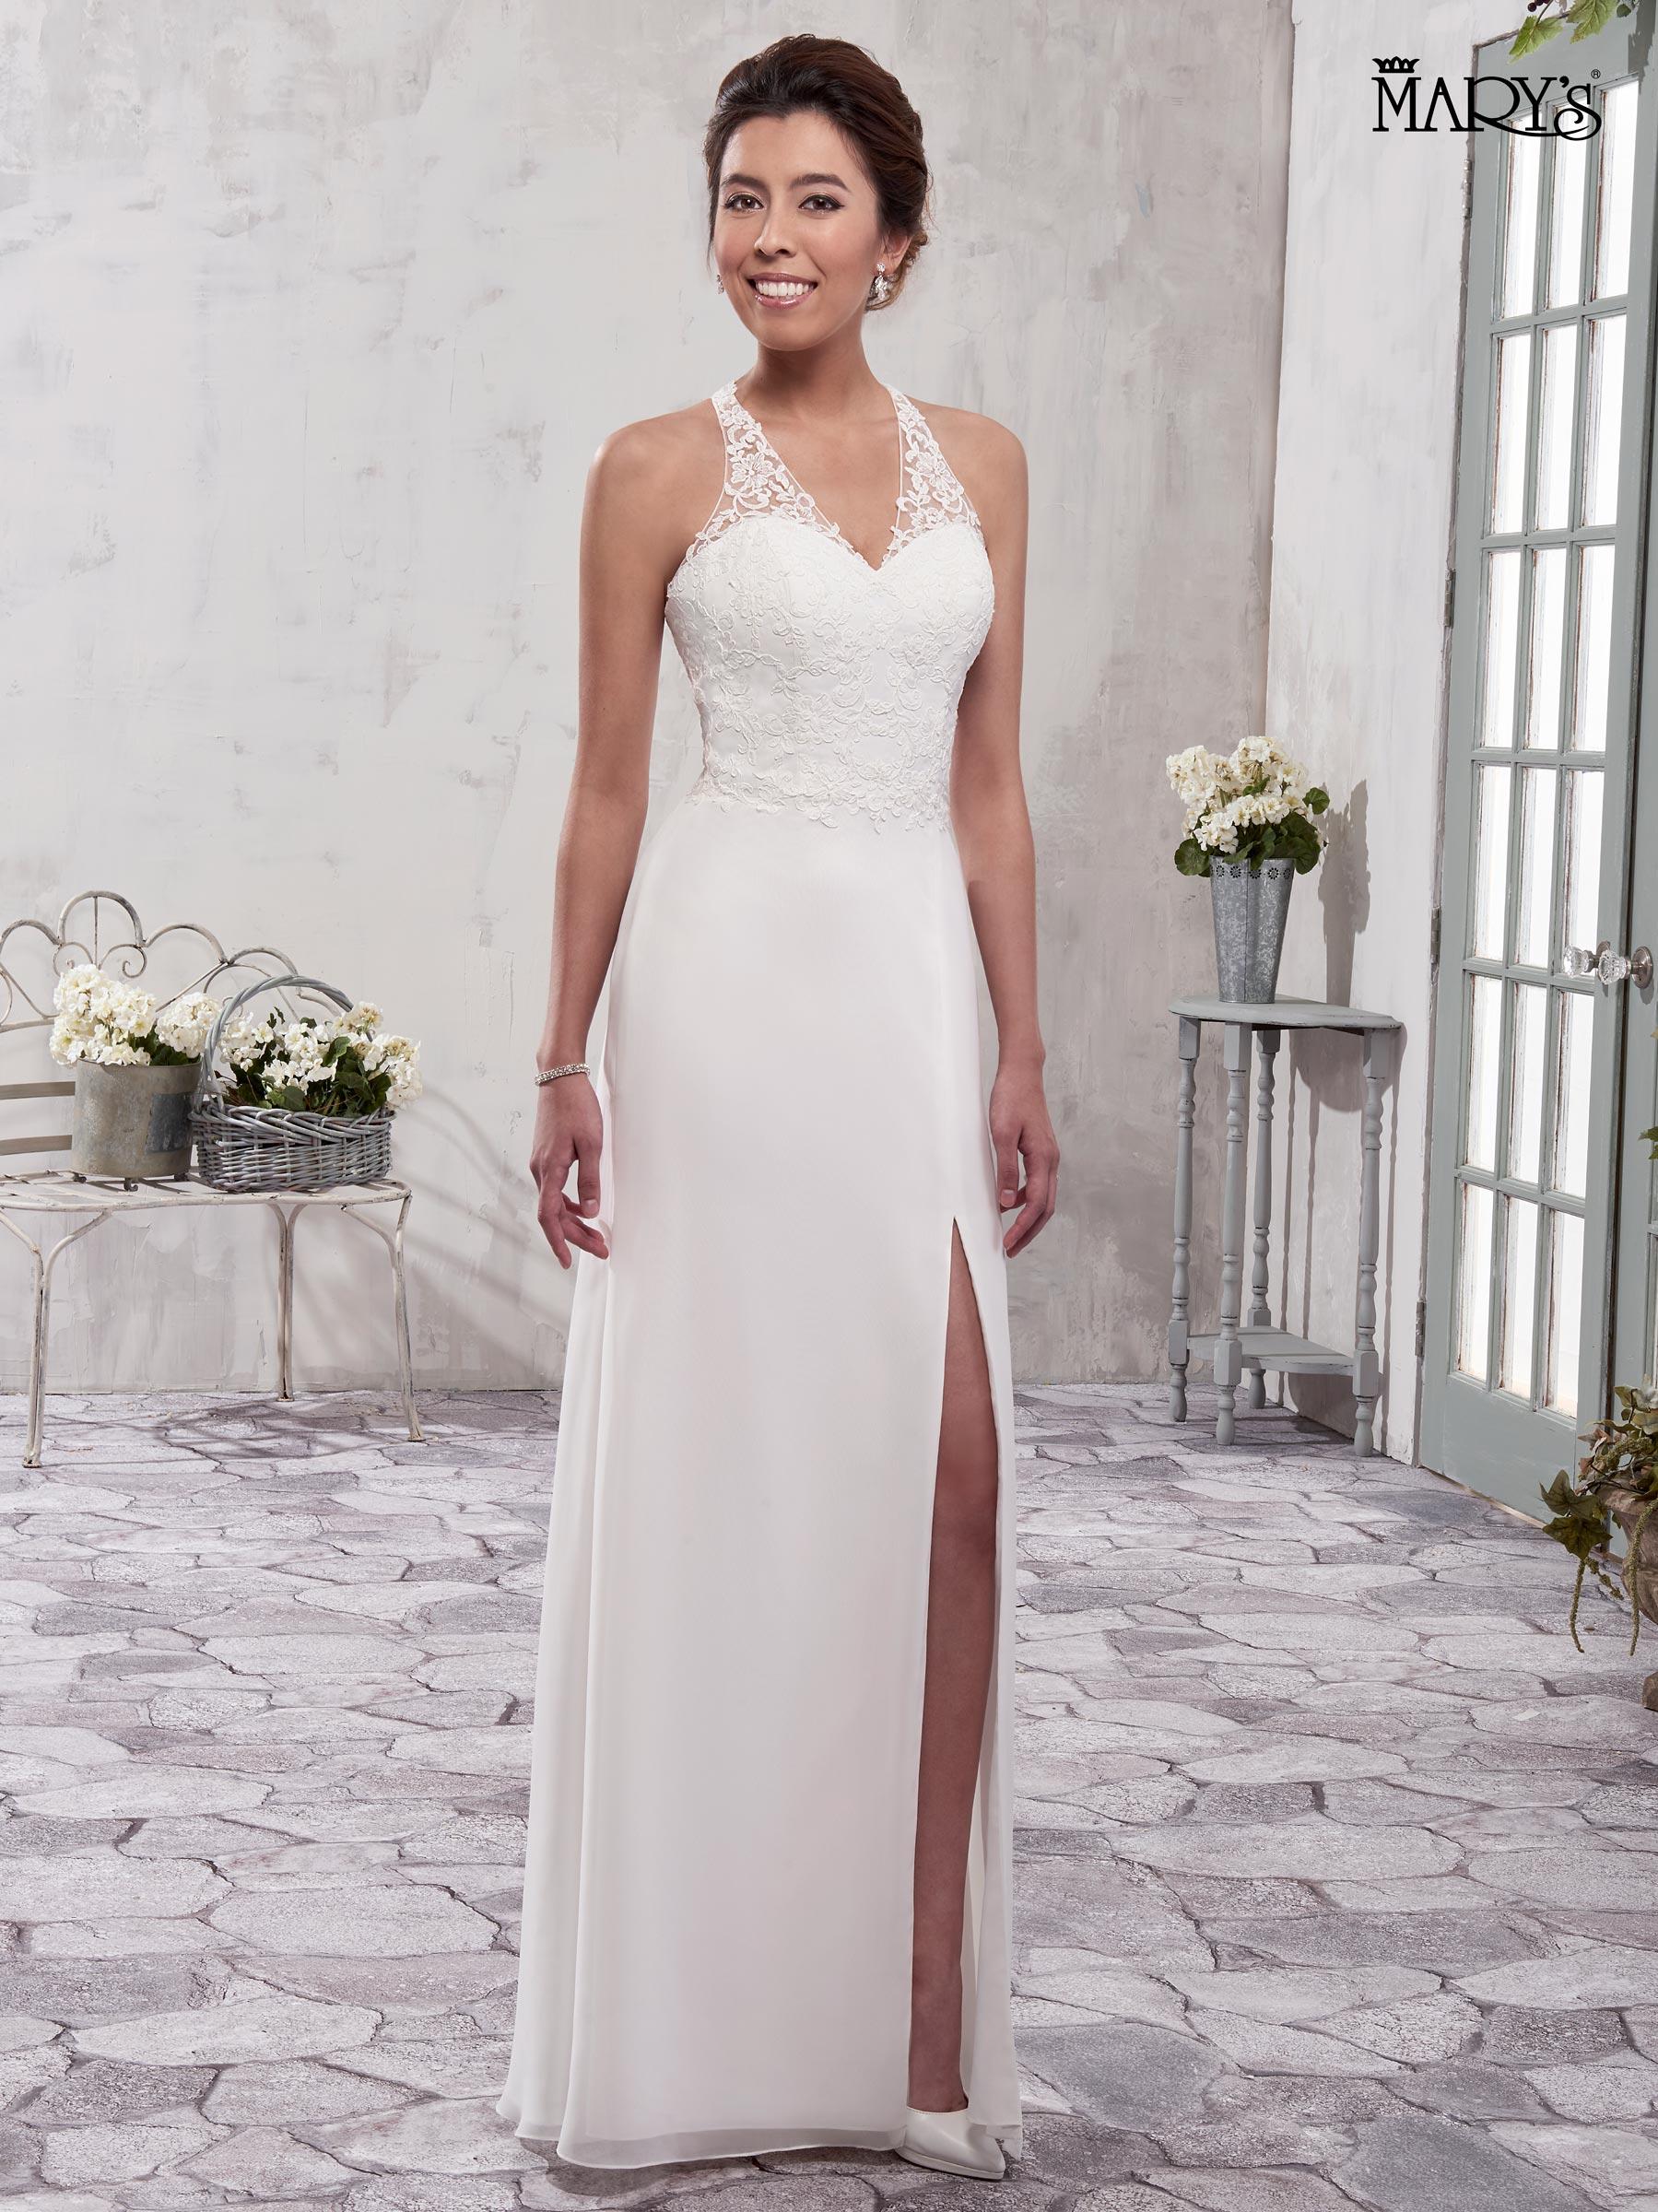 Bridal Wedding Dresses   Mary's   Style - MB1006